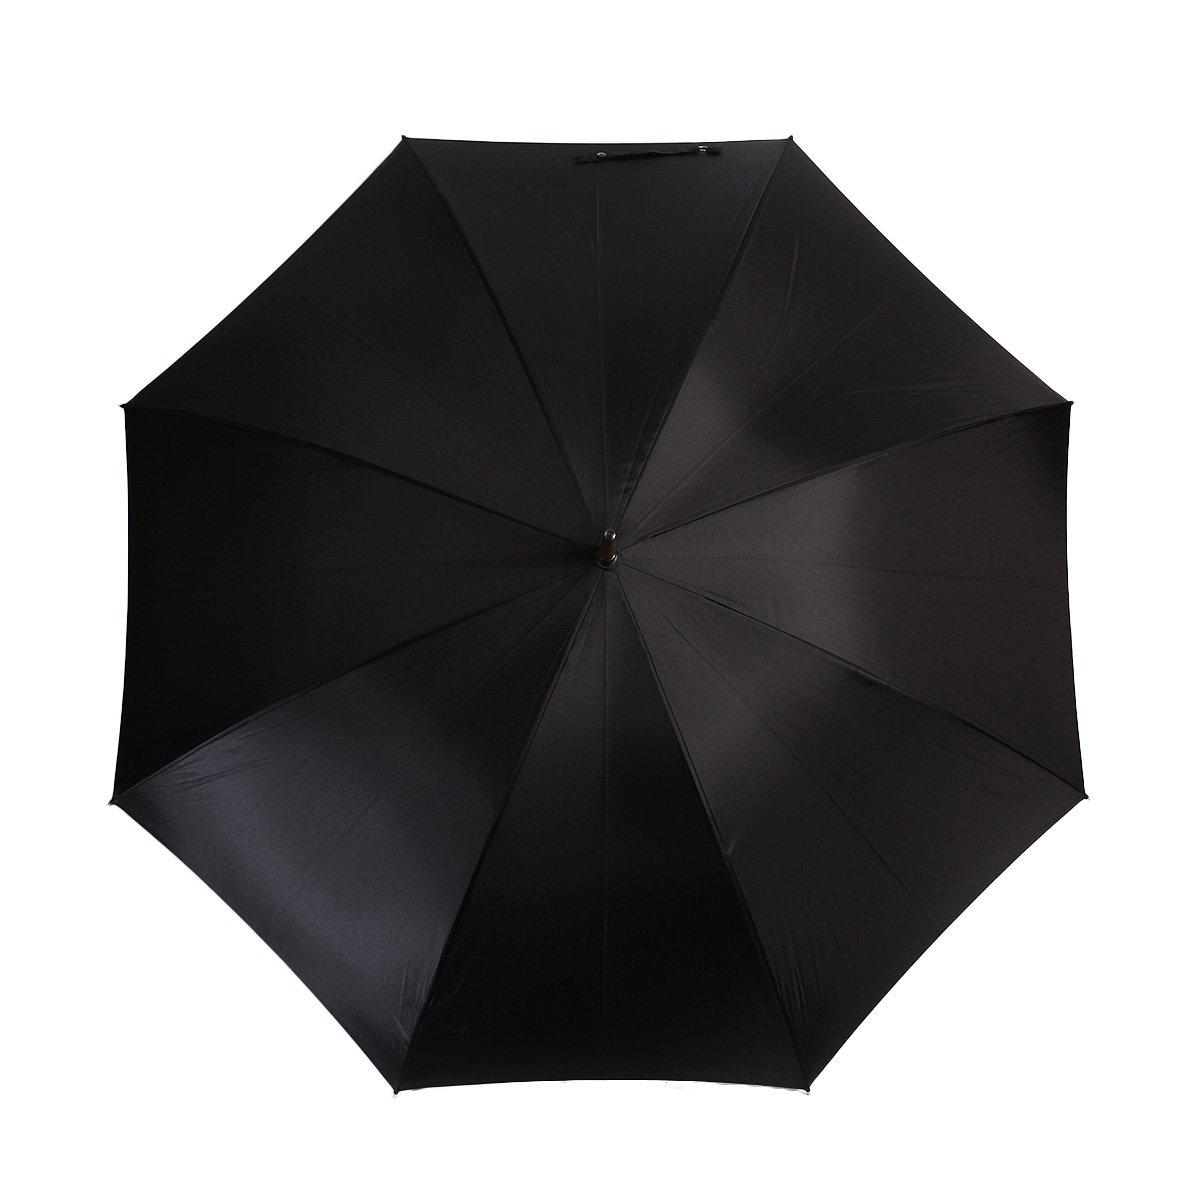 【10%OFF】【公式限定】富士絹 細巻き 長傘(アイアンウッド) 詳細画像5